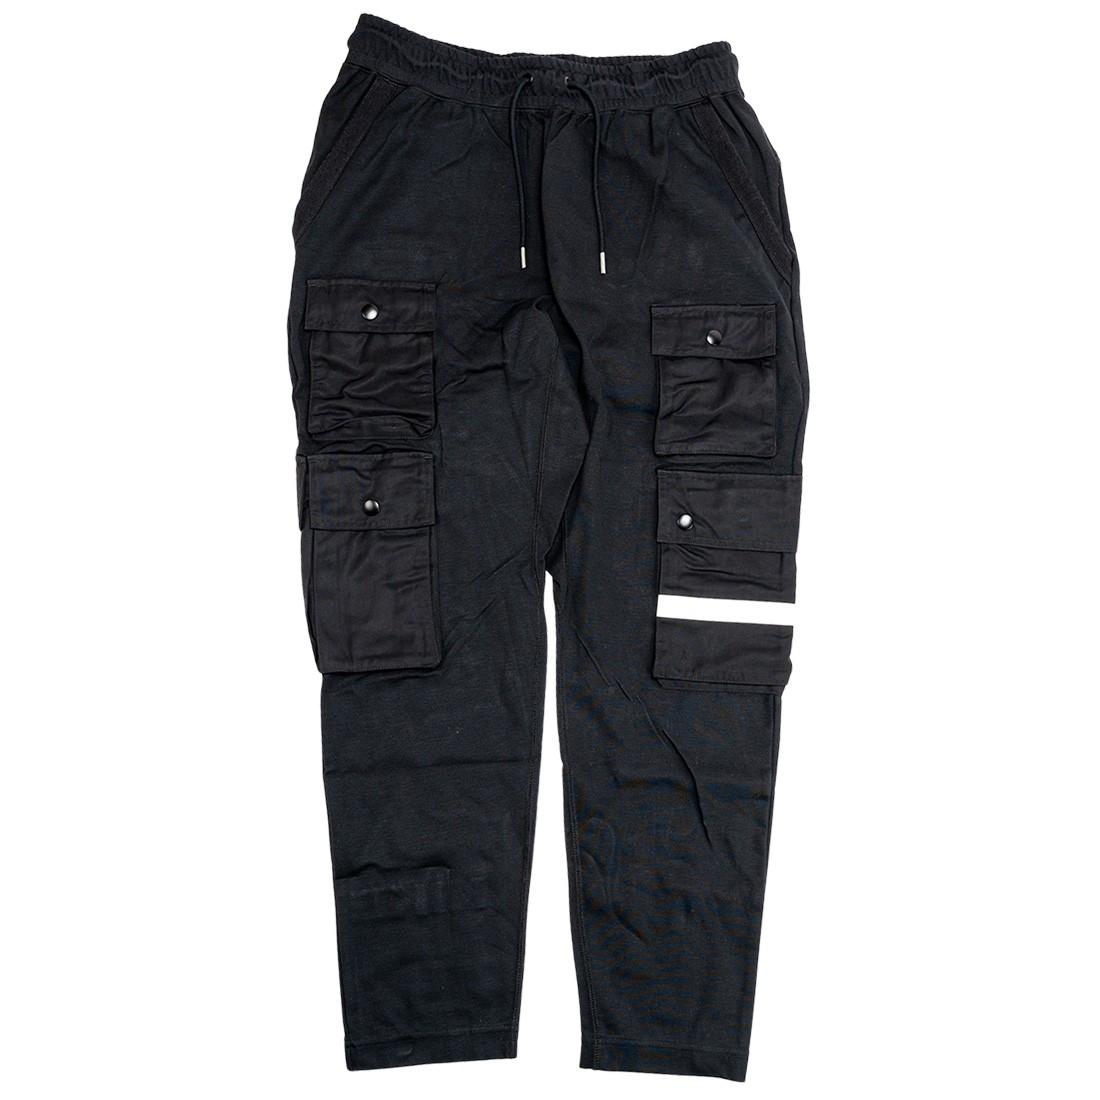 Nike Men Sportswear City Made Cargo Pants (black / white)